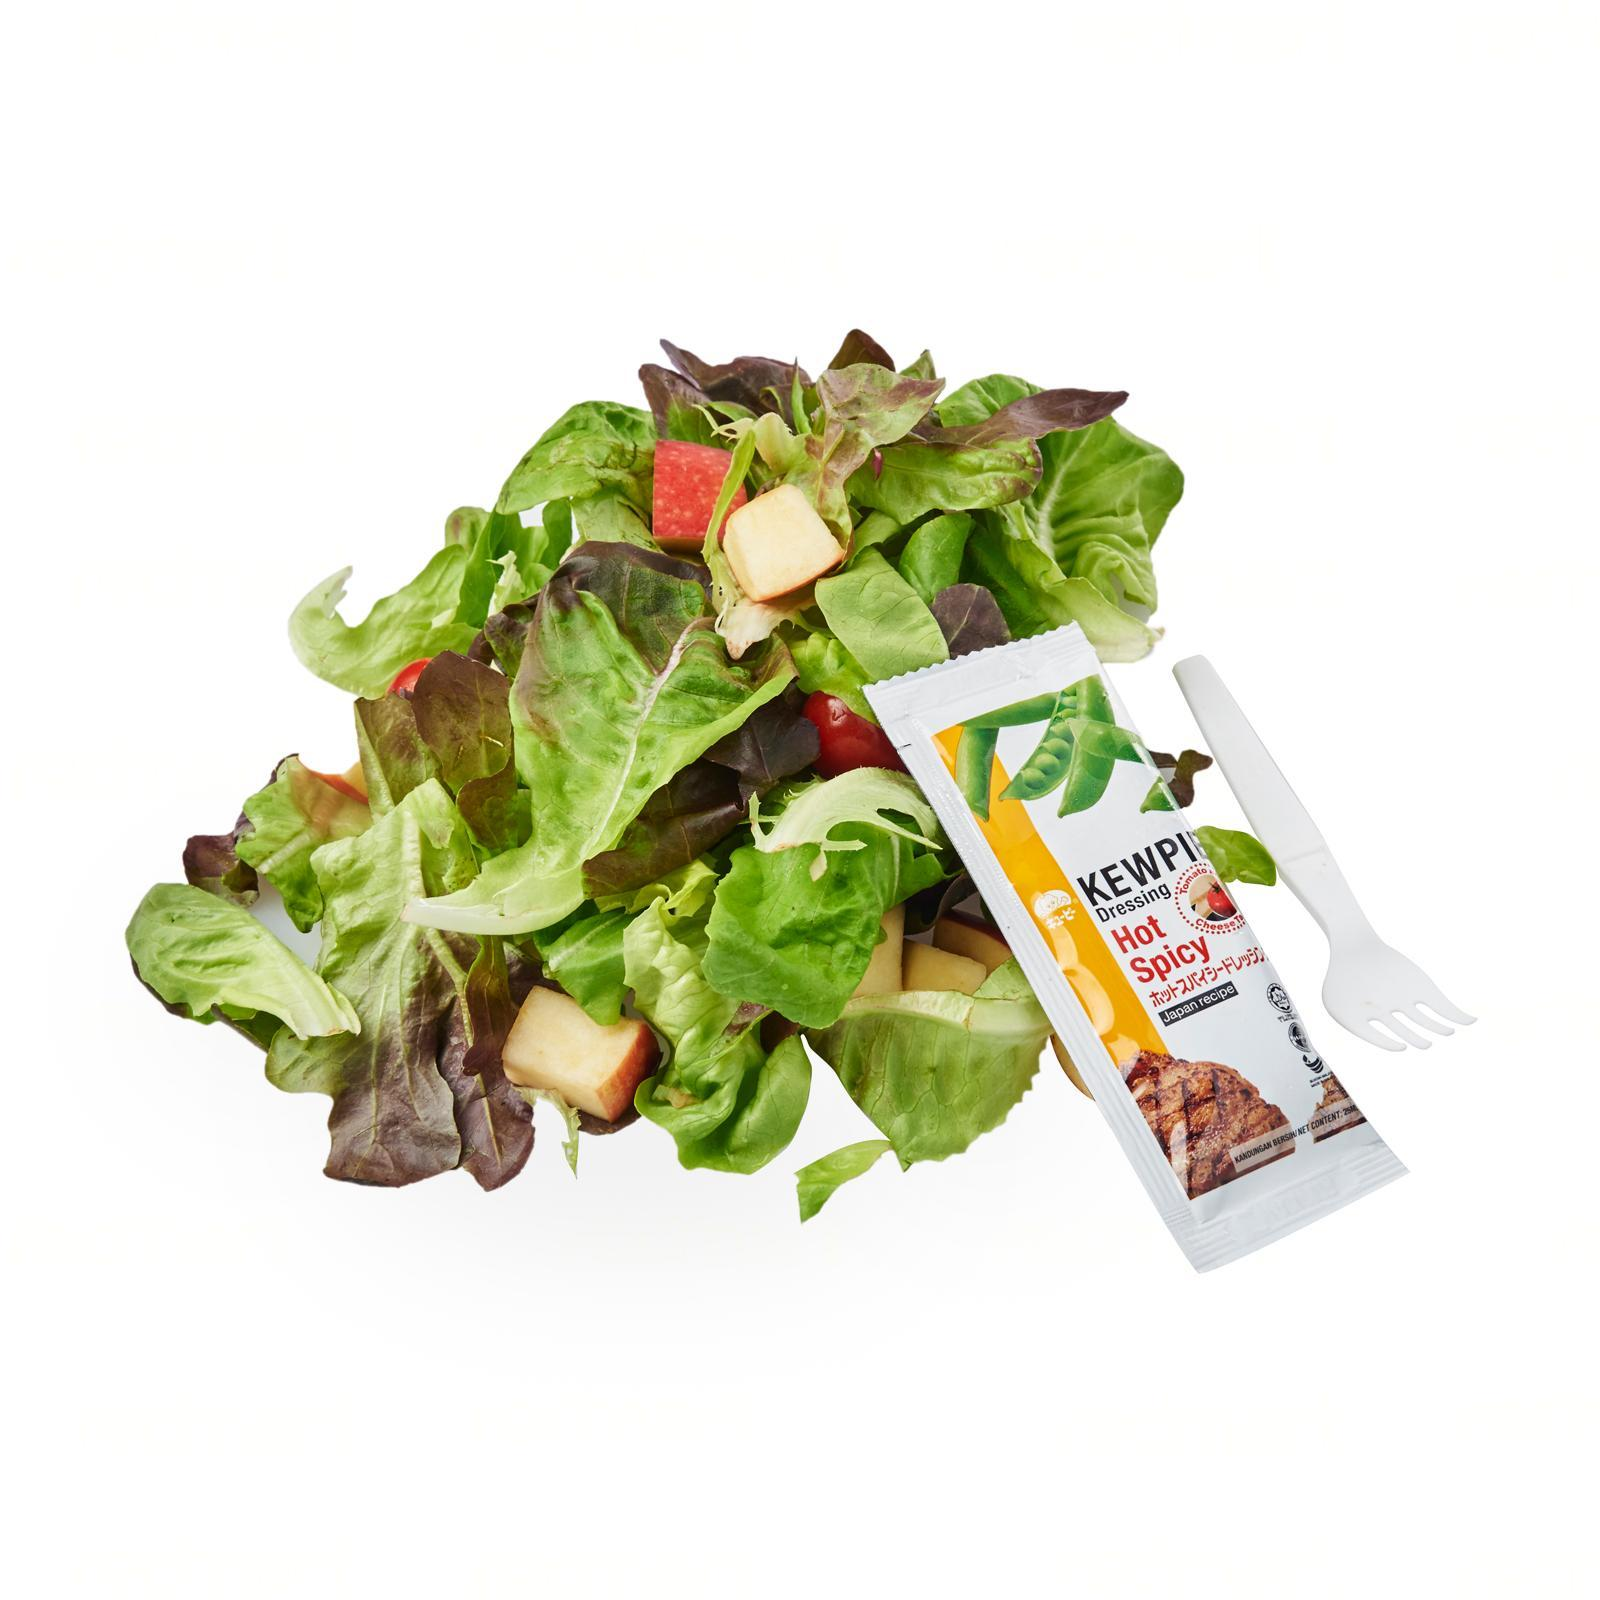 Live Well Summer Fruit Salad